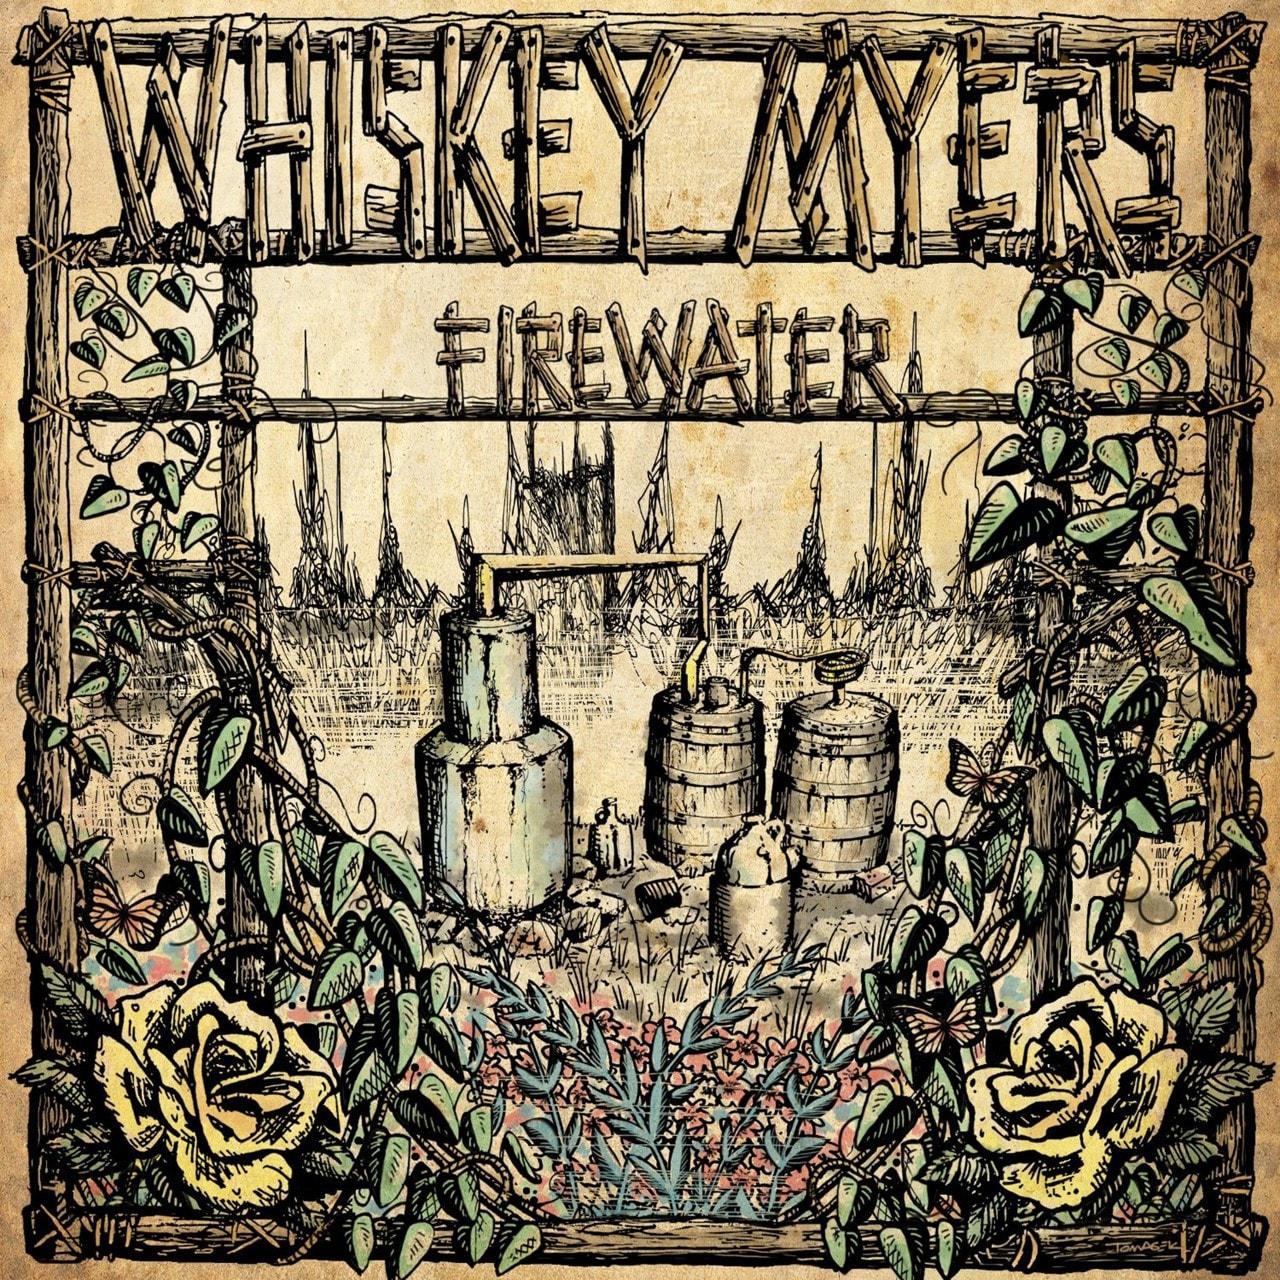 Firewater - 1